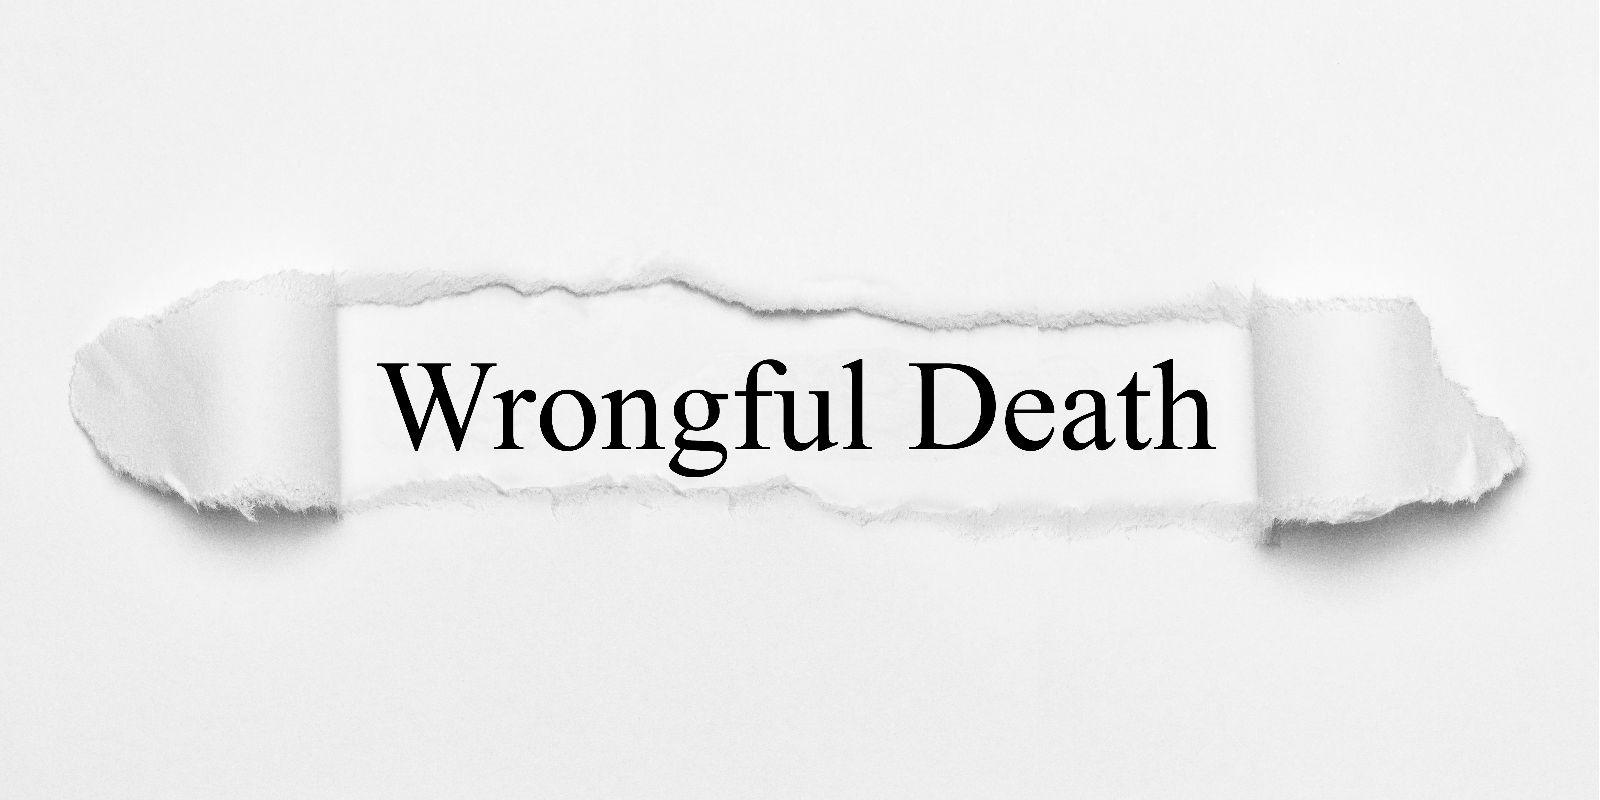 Louisiana Wrongful Death Lawyer Flattmann Law